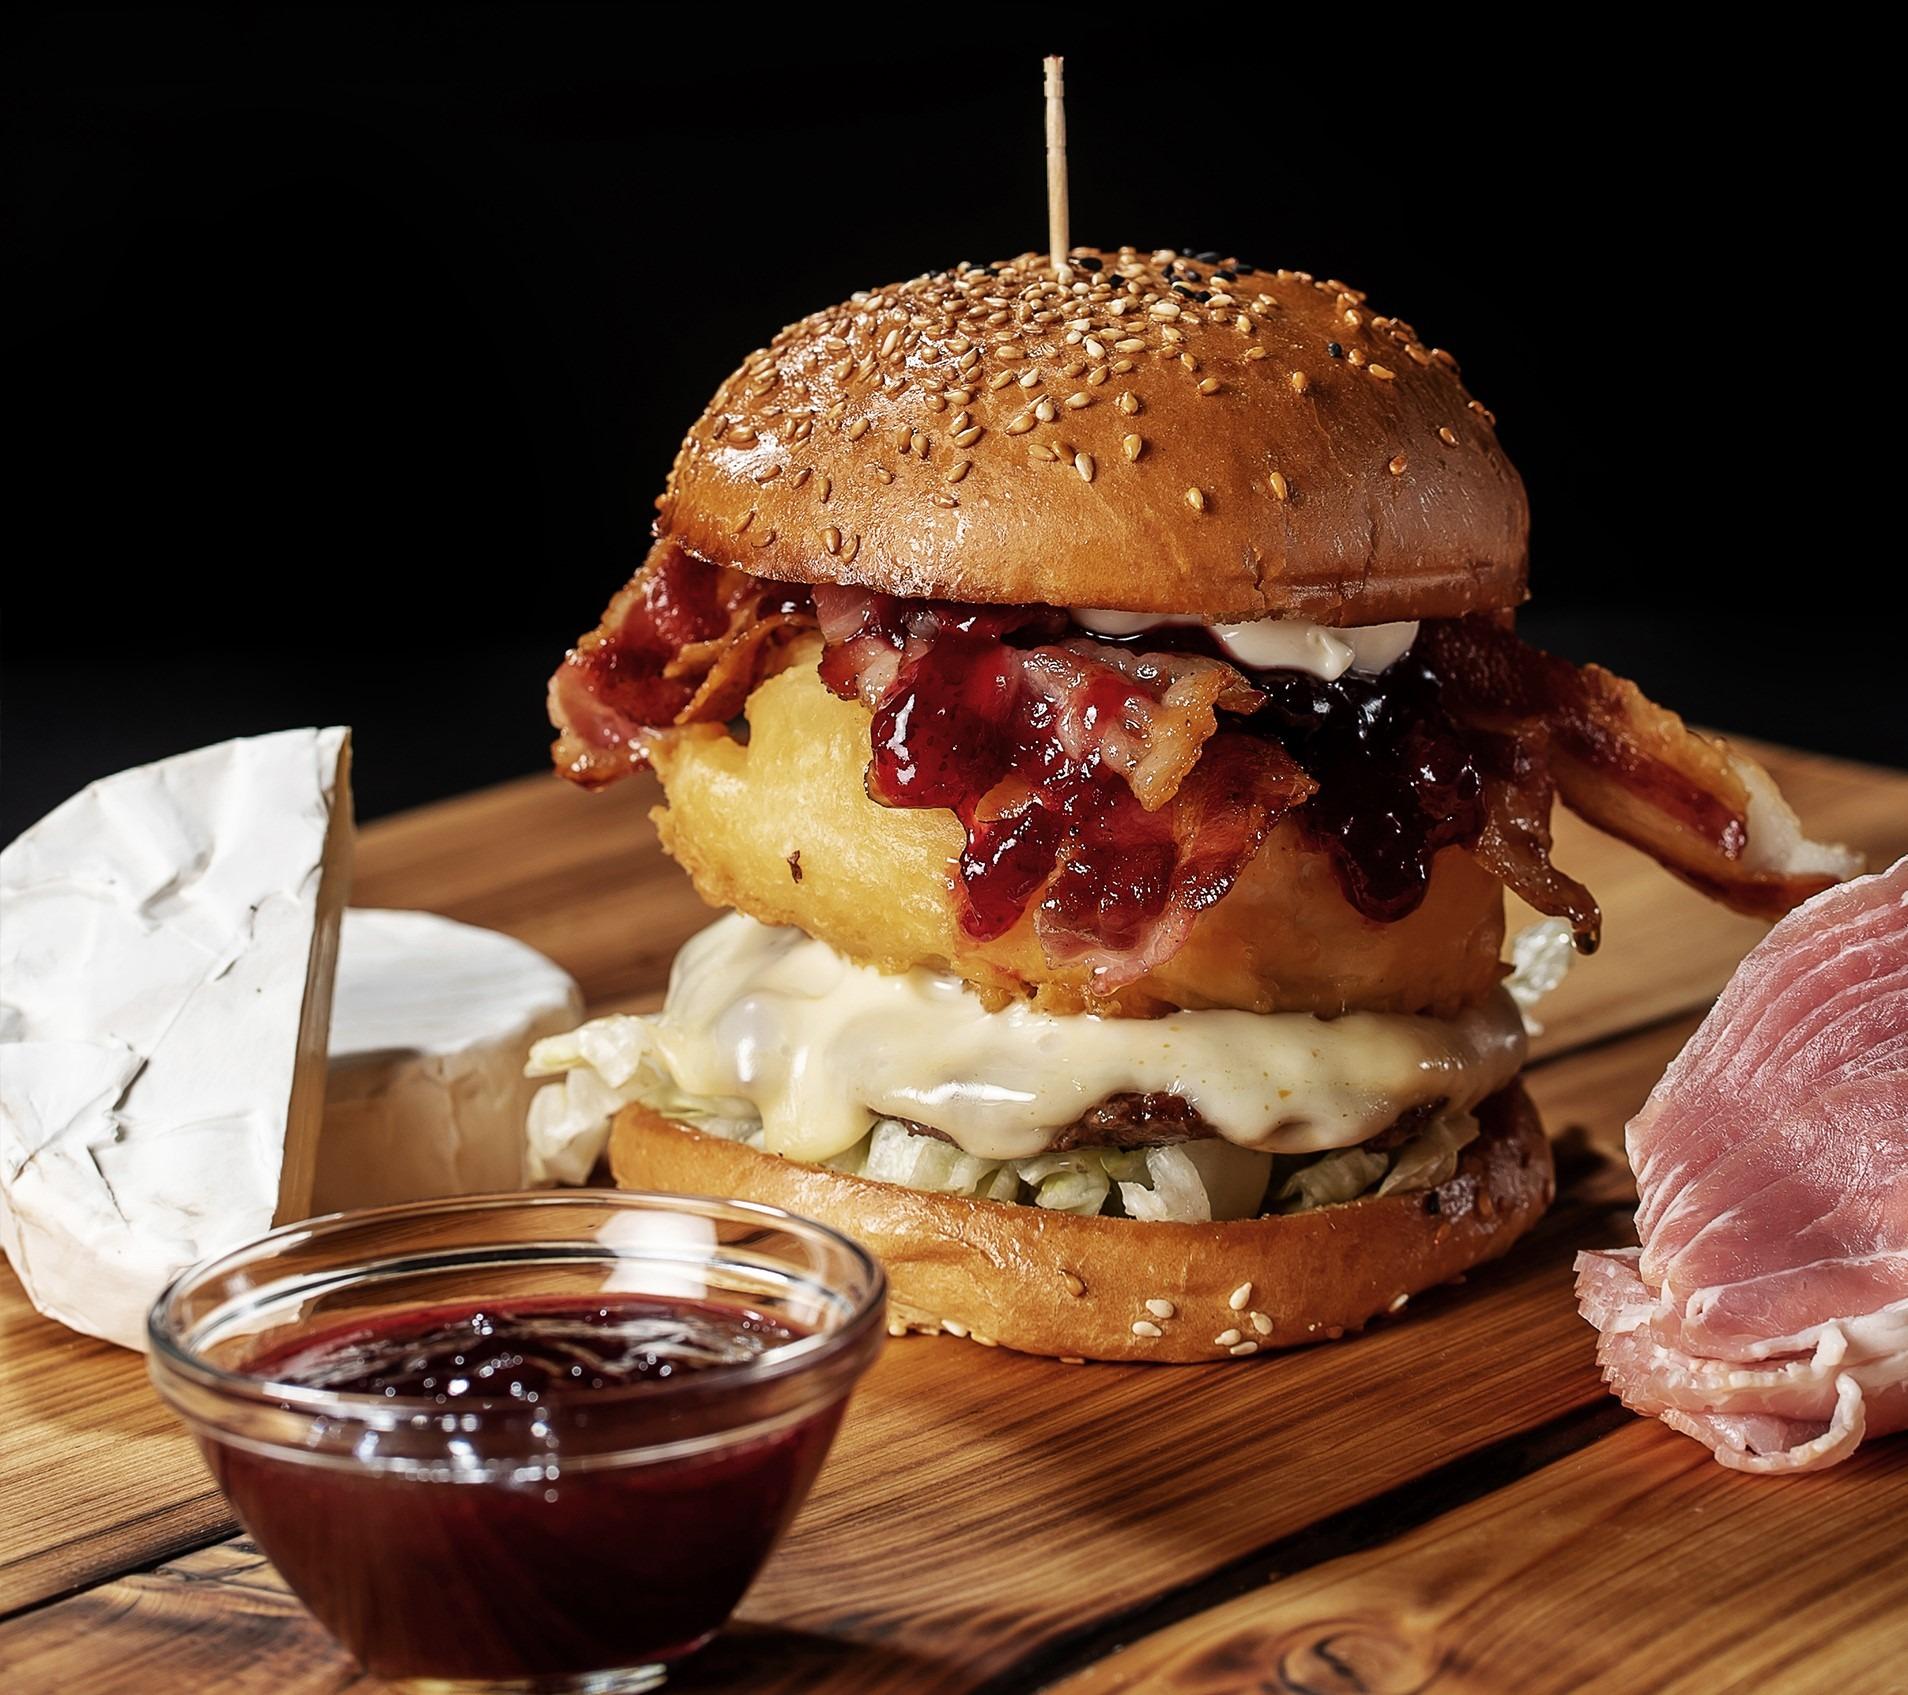 Burgerglück Camembert Cheese Burger